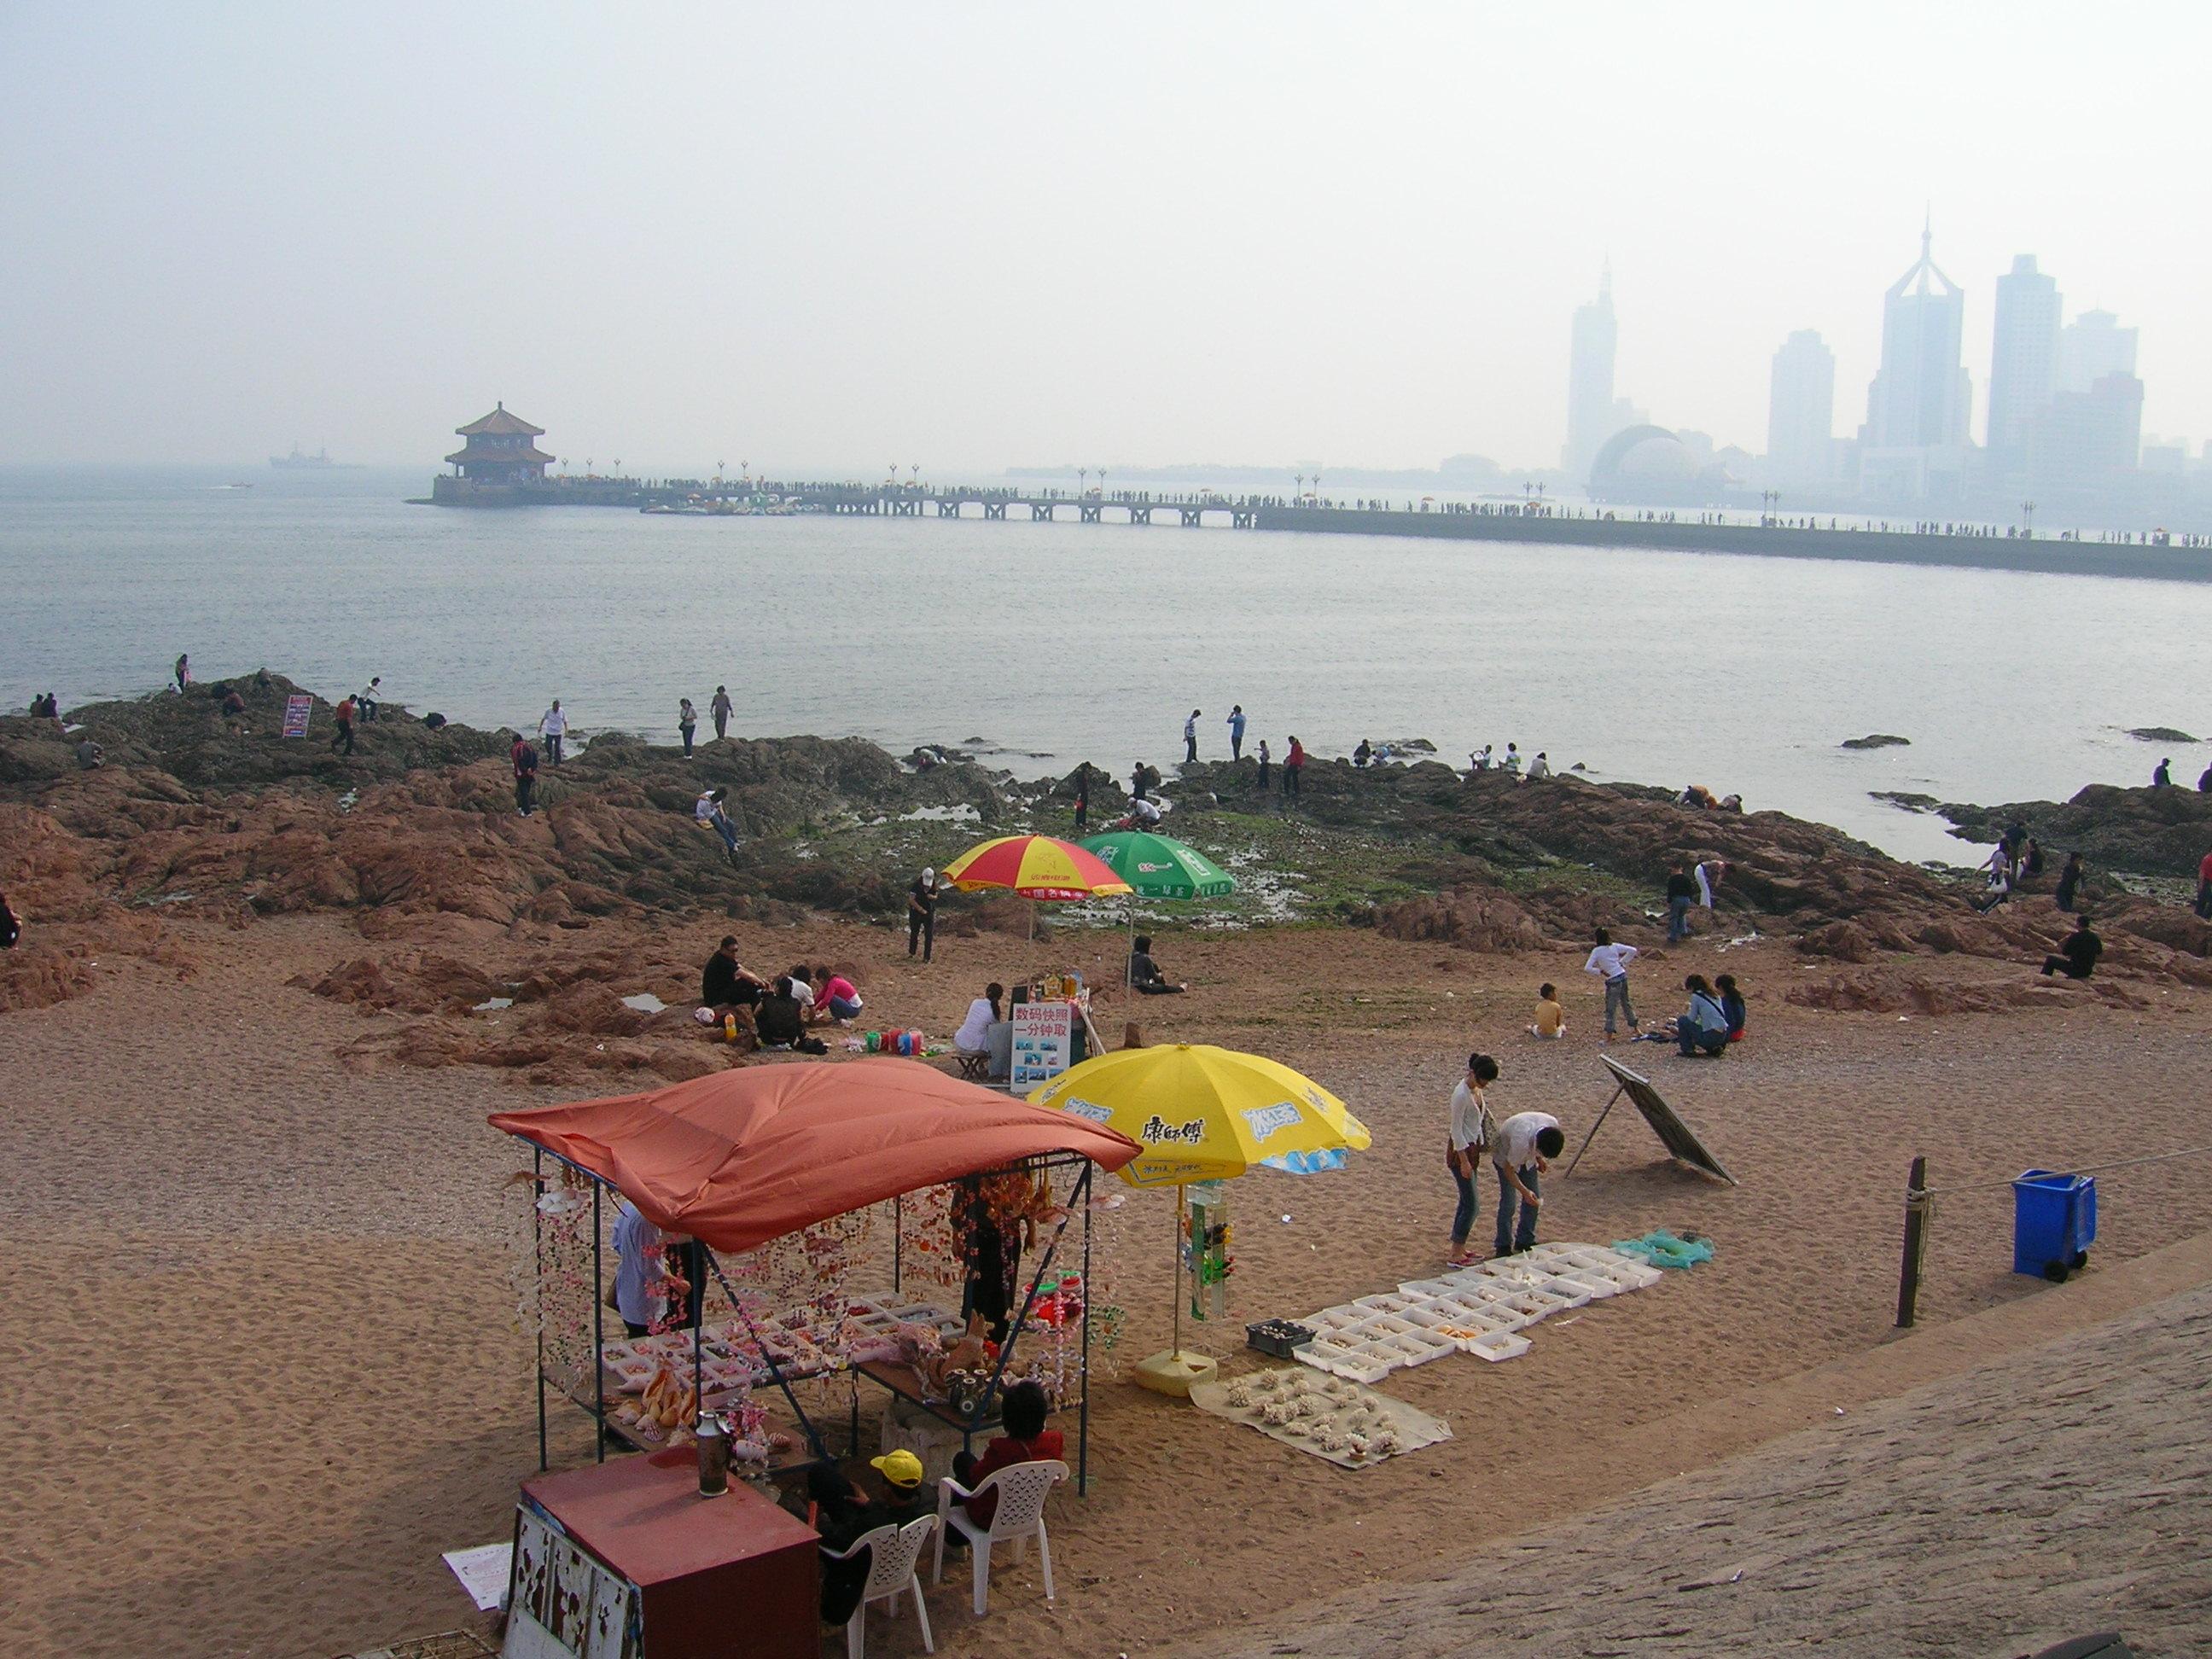 balade sur la côte Qingdao Chine